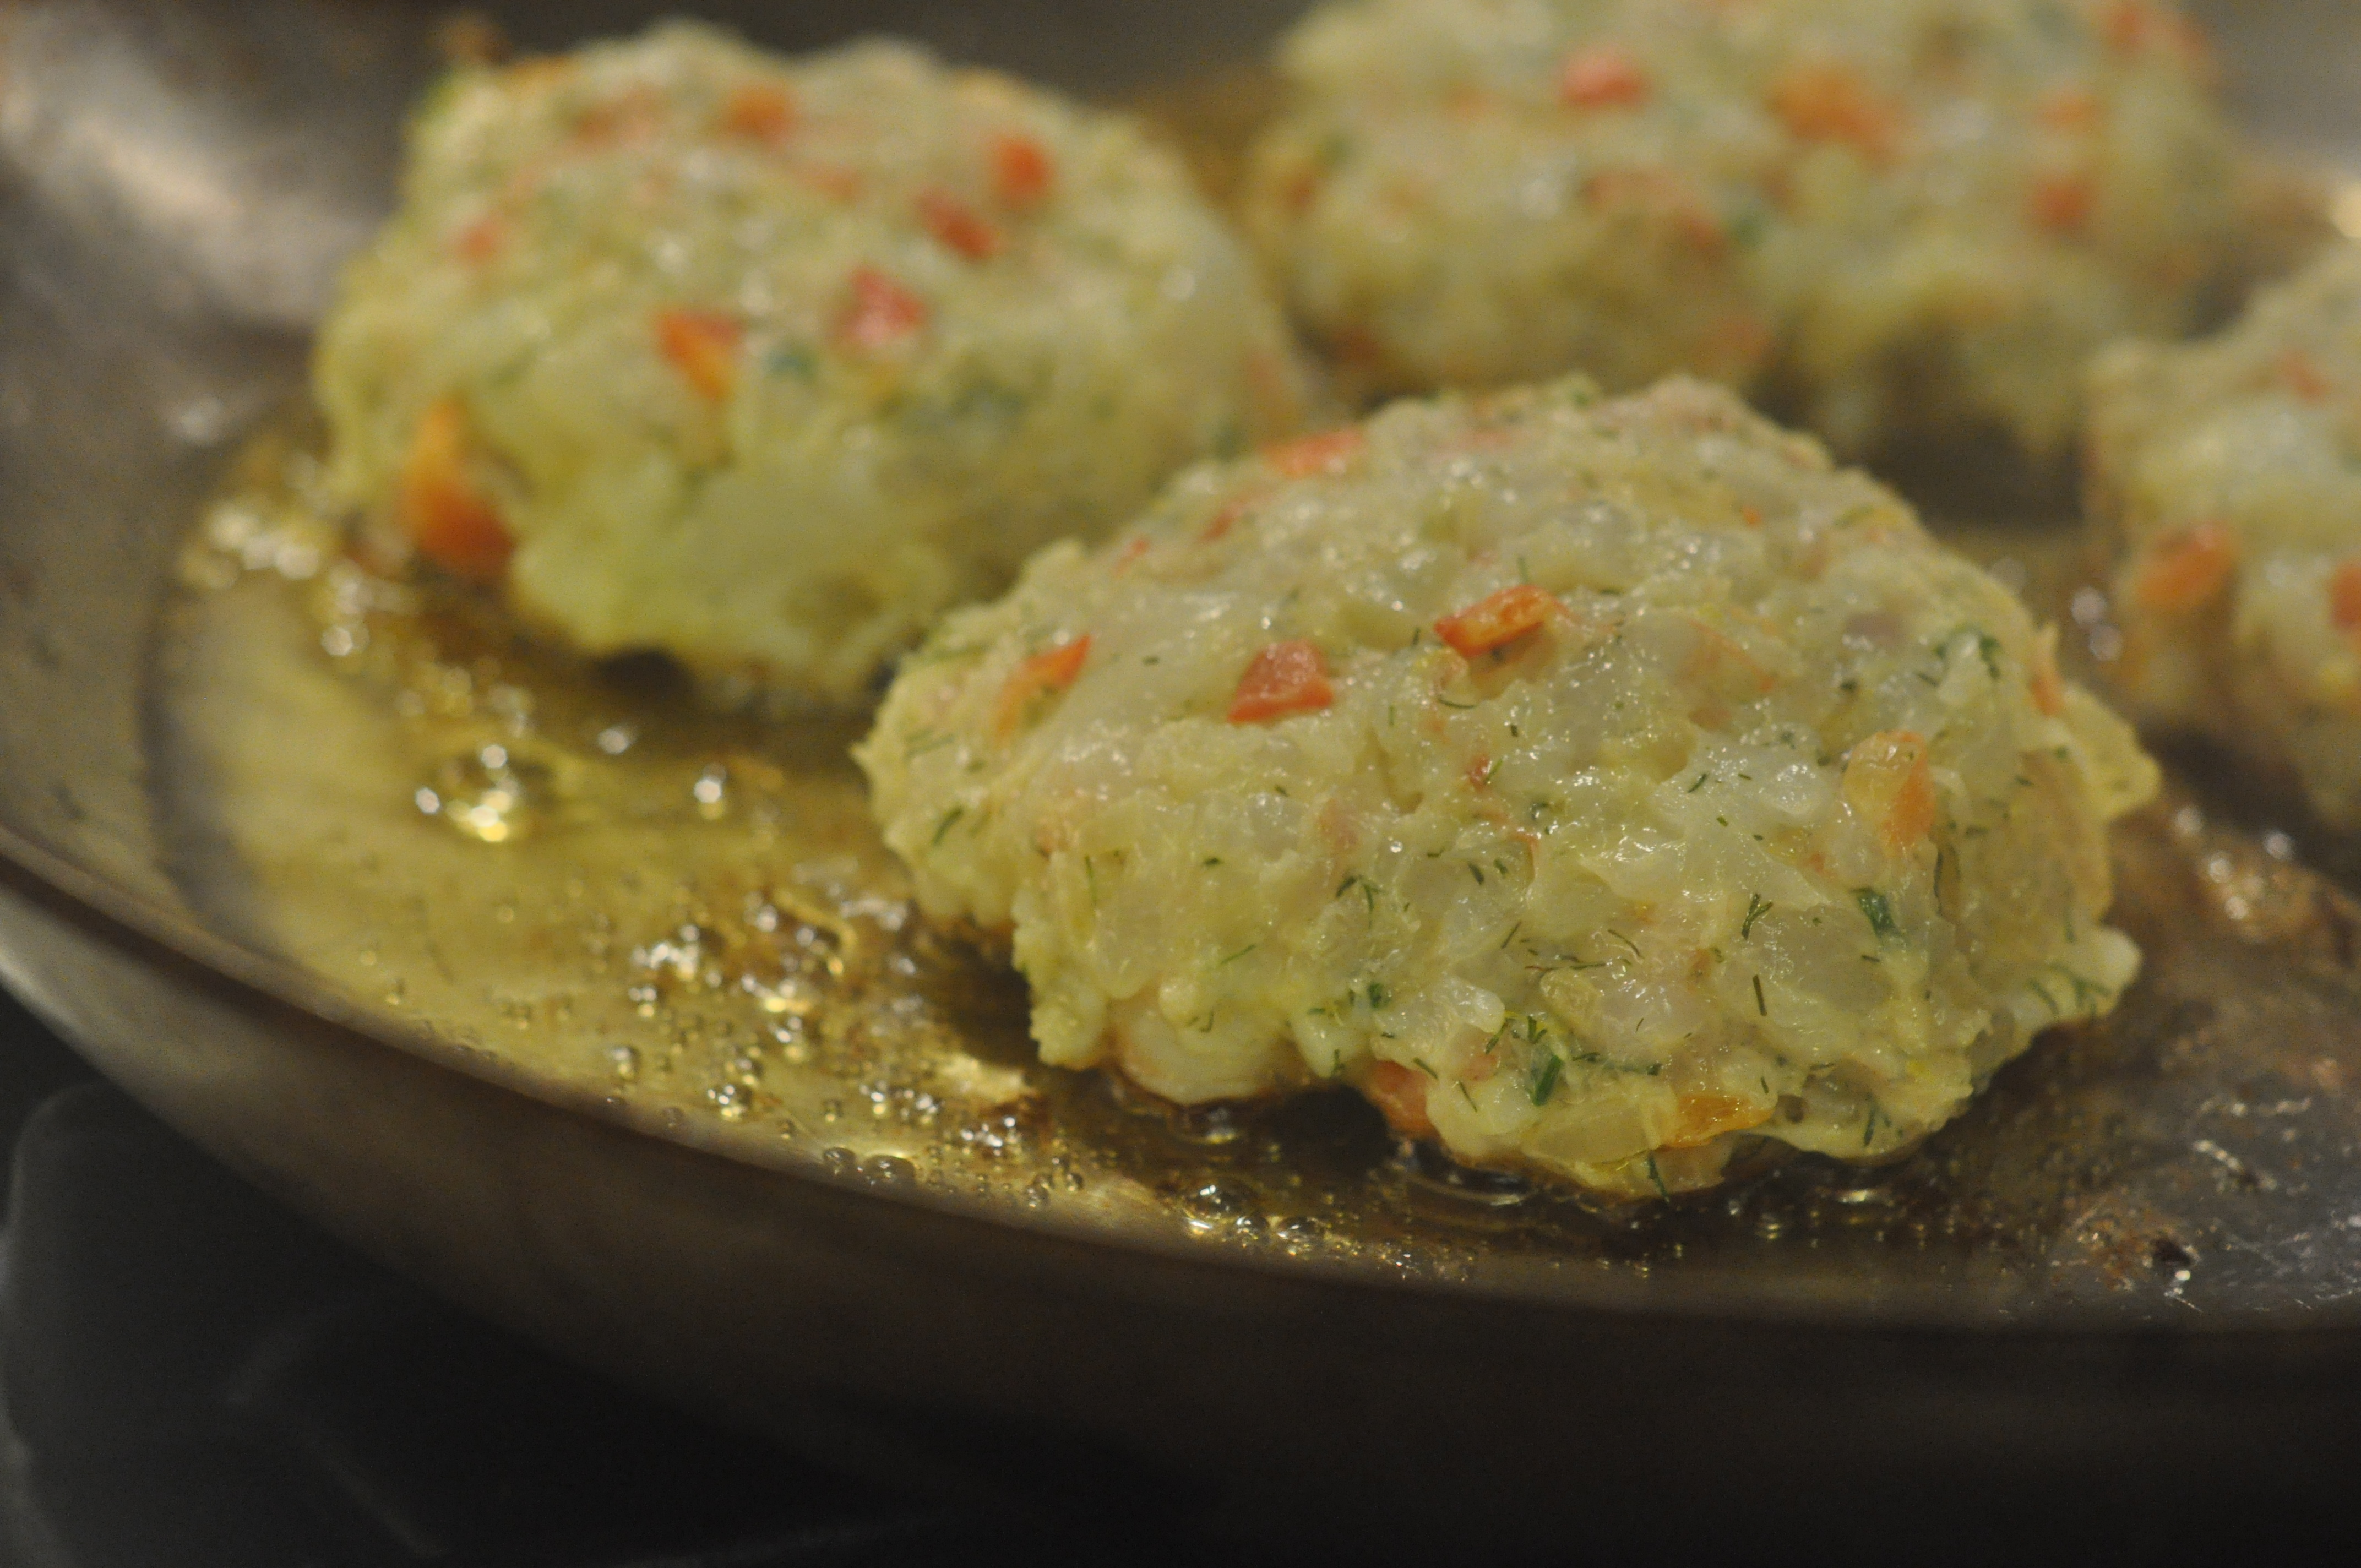 food52's Shrimp Burgers with Roasted Garlic-Orange Aioli